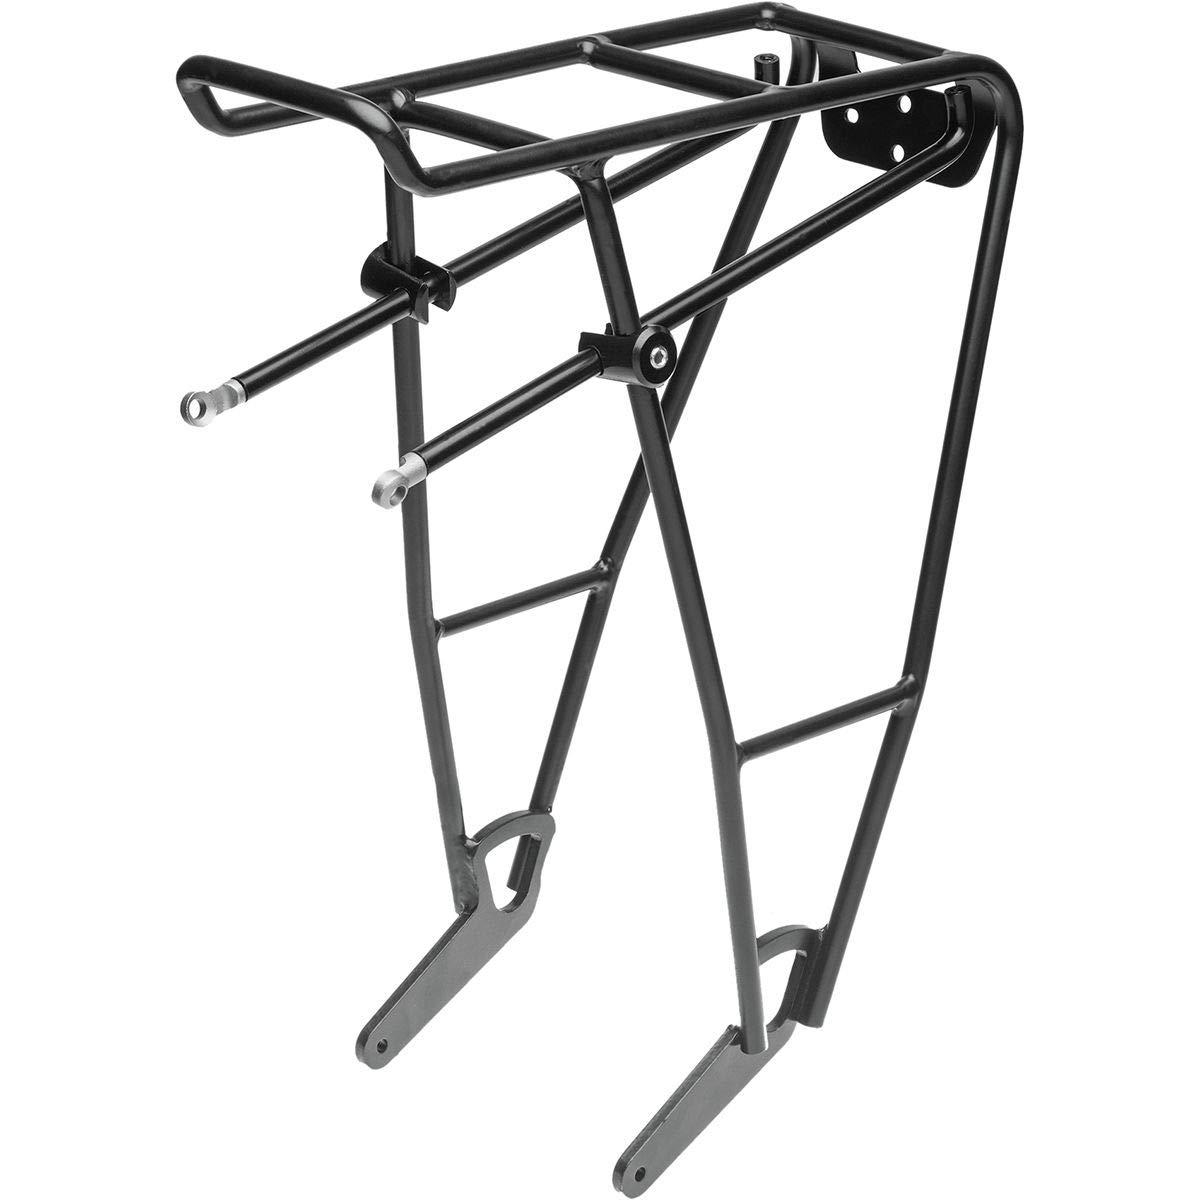 Amazon.com: Blackburn Grid 1 Rear Rack: Sports & Outdoors